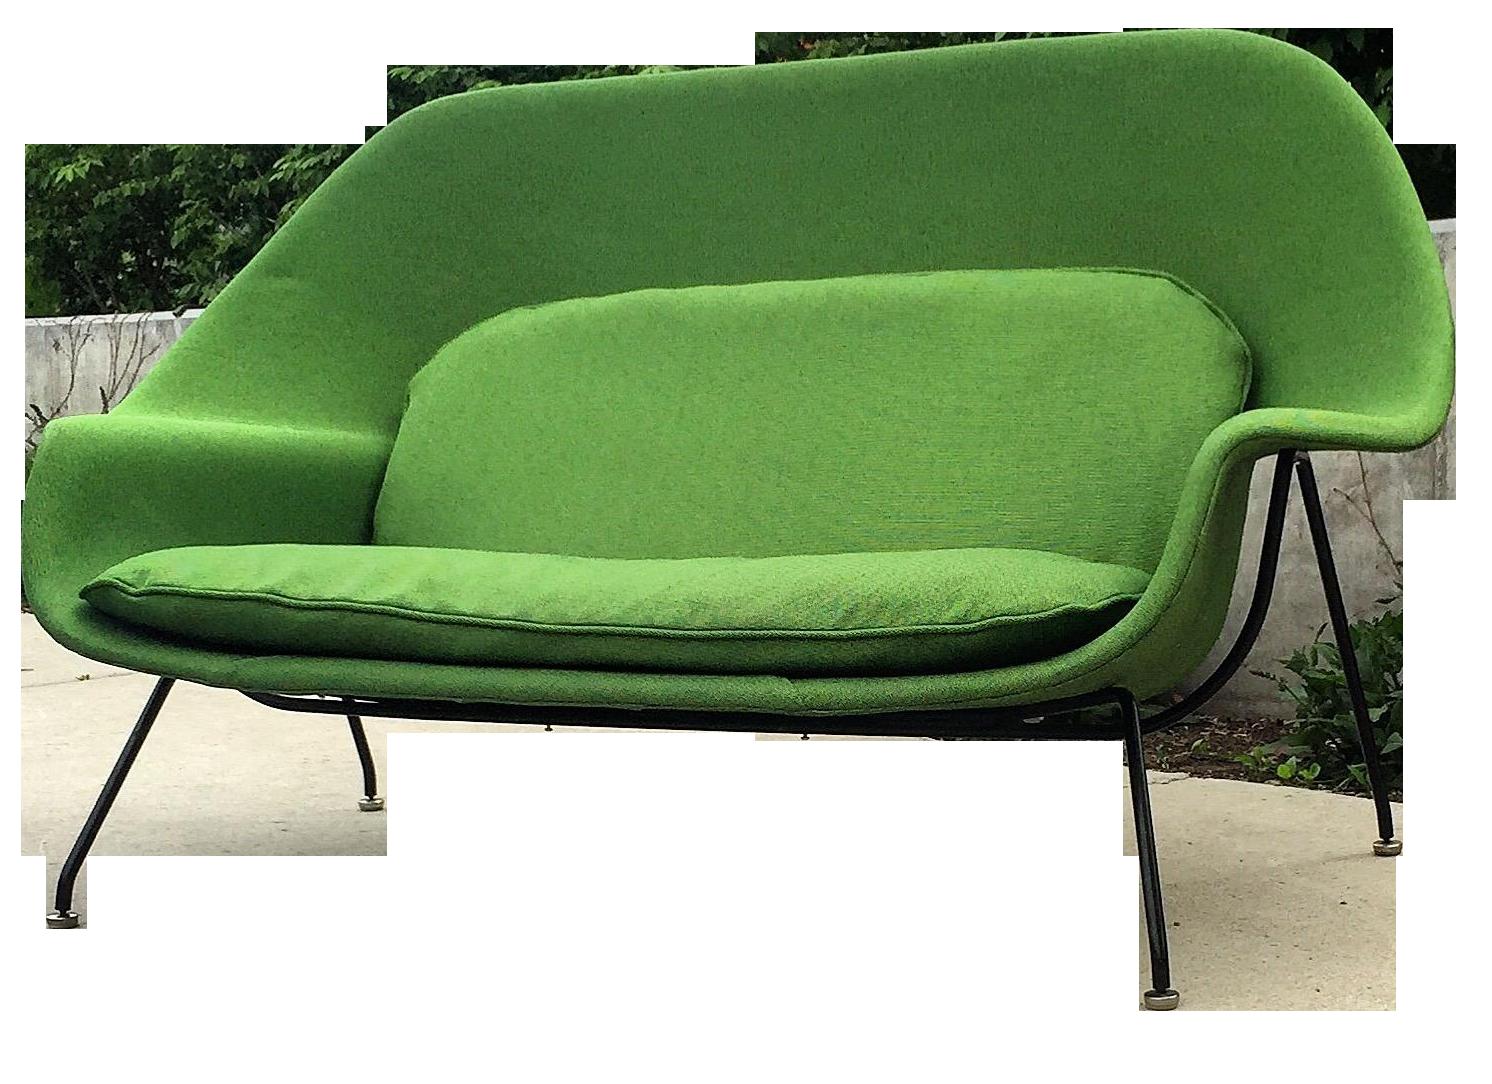 Genial Vintage Eero Saarinen For Knoll Womb Settee Sofa